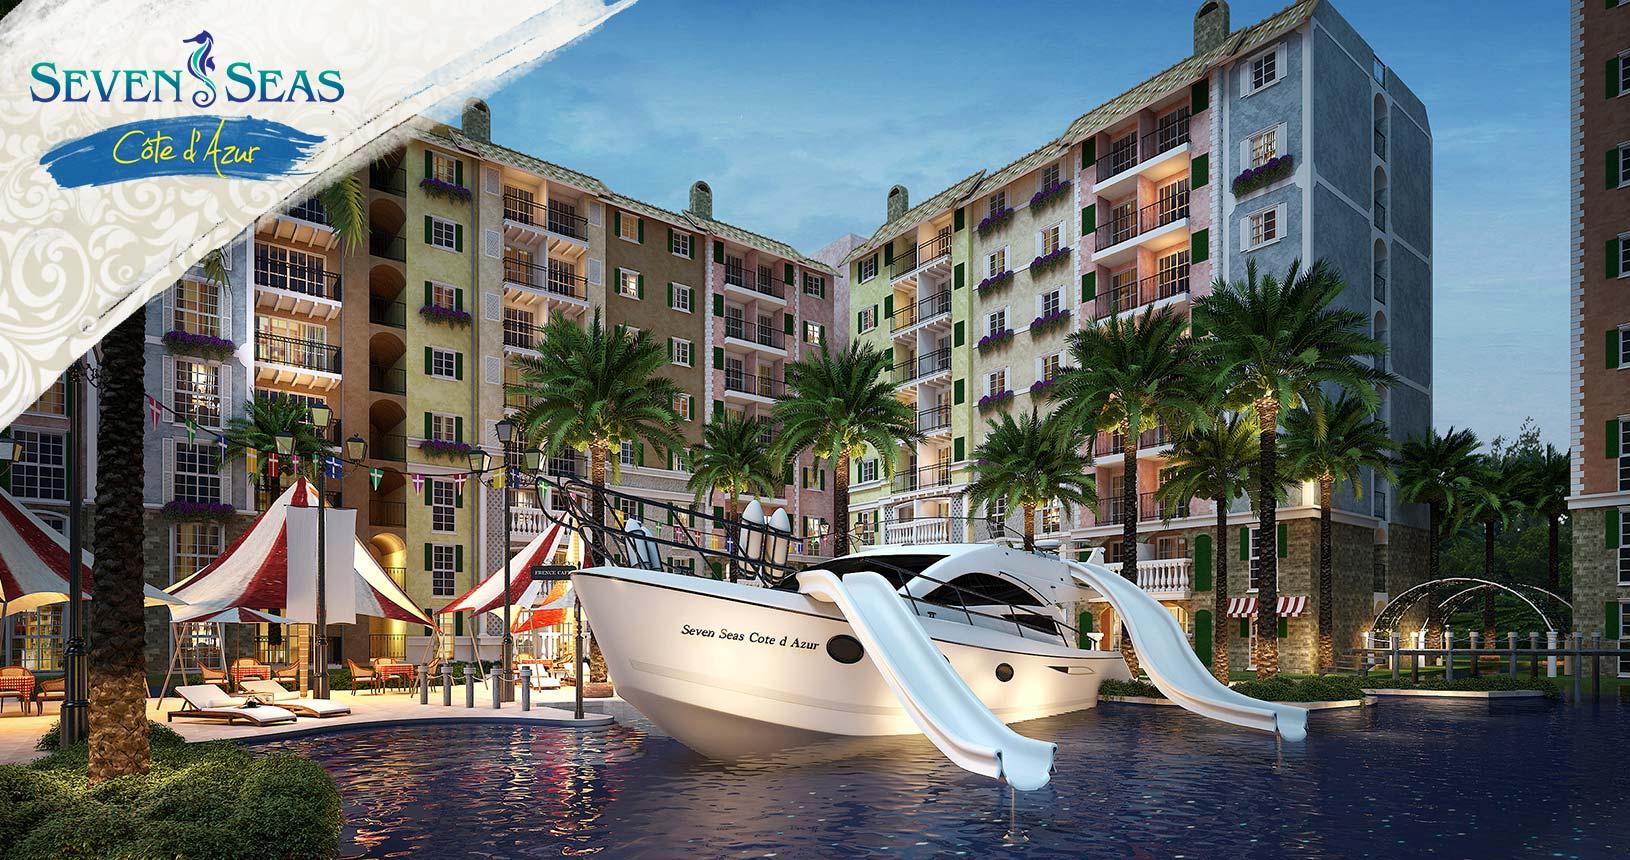 features-images-monaco-yacht